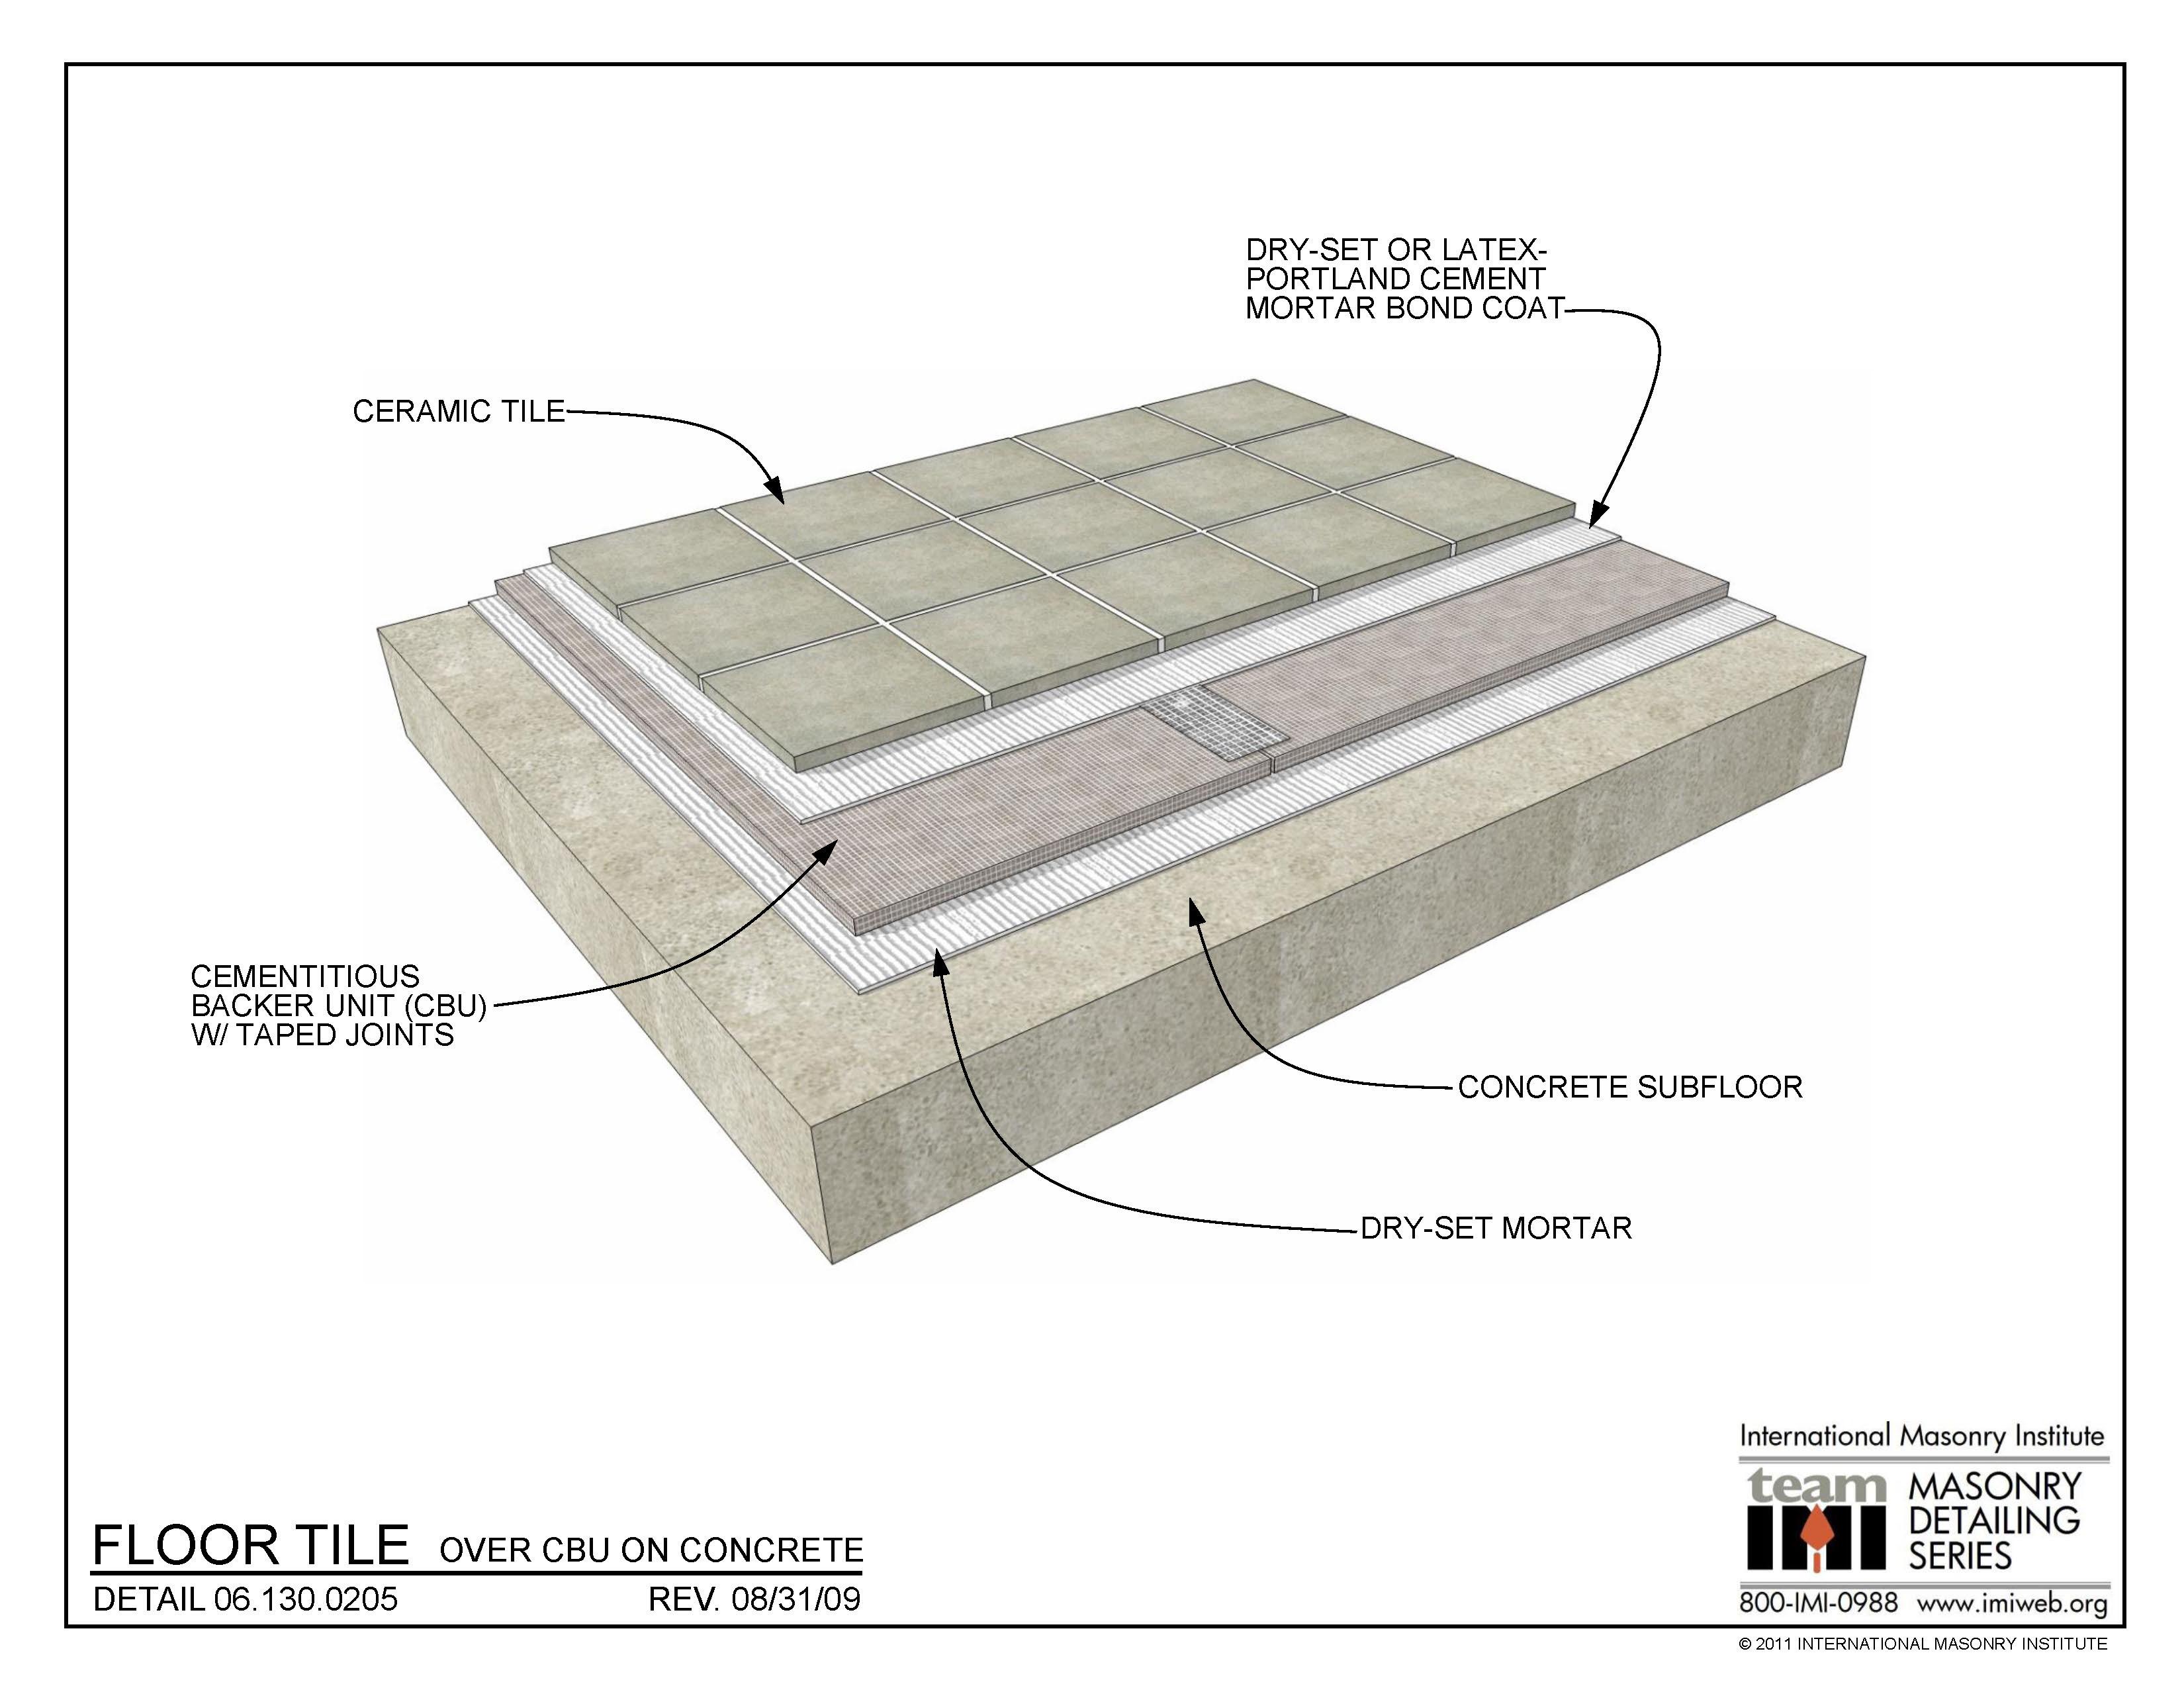 06.130.0205: Floor Tile - Over CBU on Concrete  International Masonry Institute